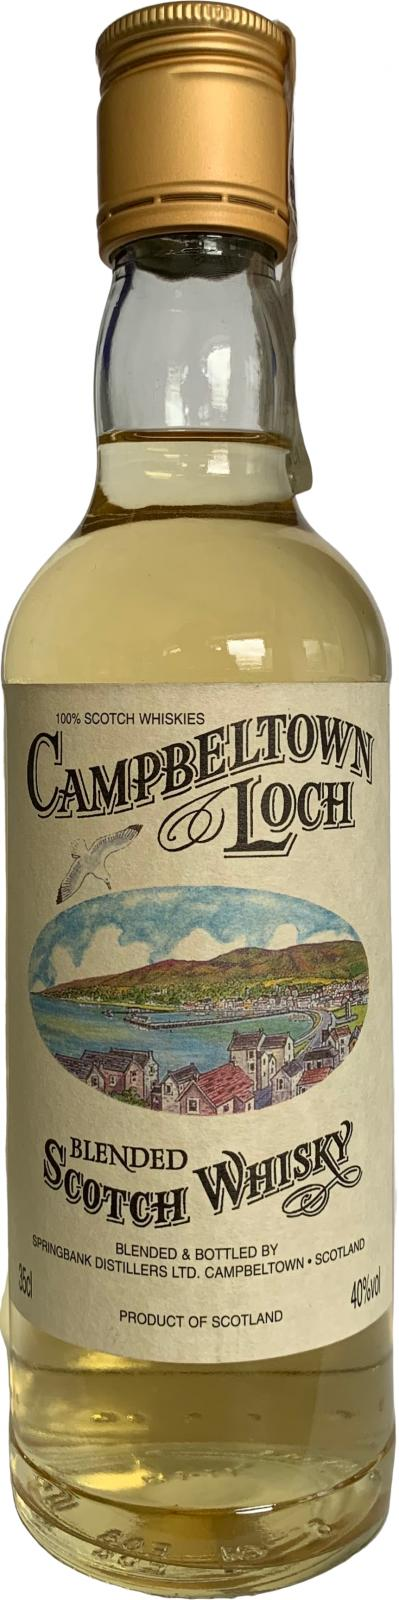 Campbeltown Loch 05-year-old SpD